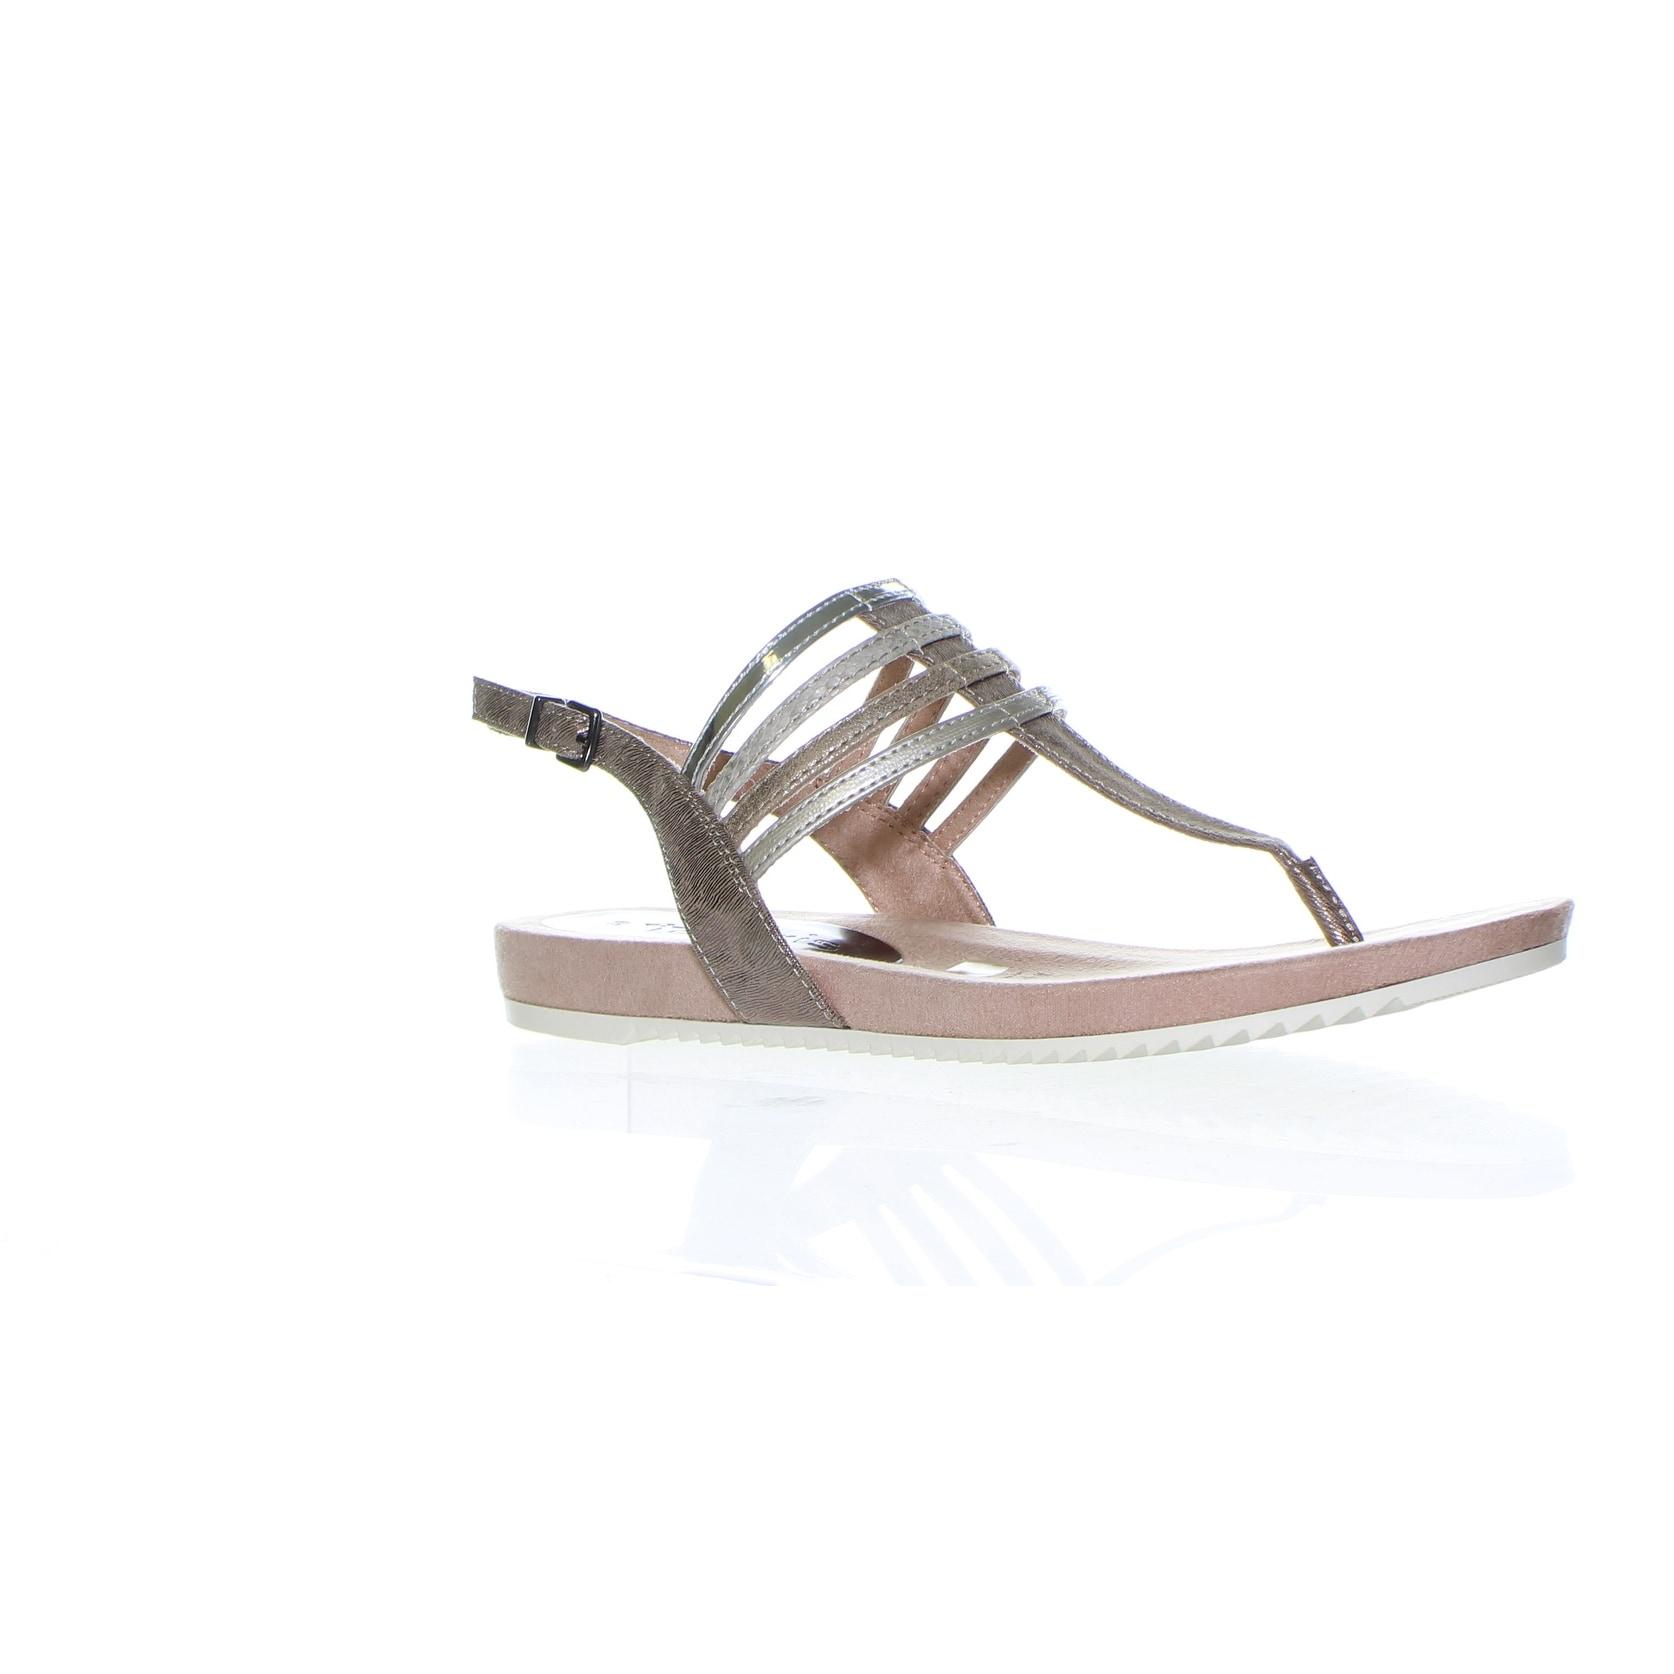 Tamaris Womens Pepper Comb Multi T Strap Sandals Size 8.5